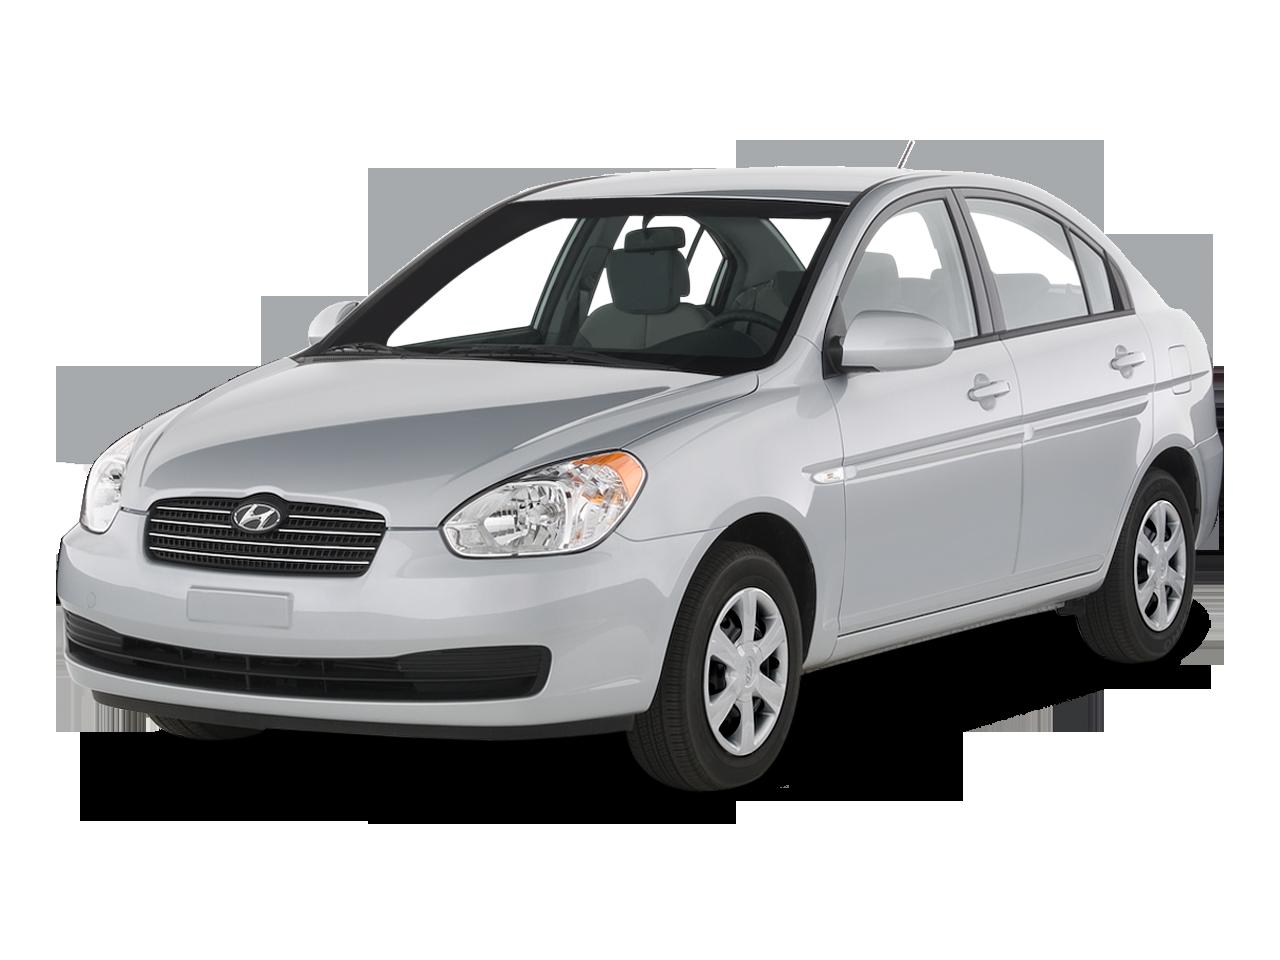 2008 Hyundai Accent Hyundai Compact Hatchback Review Automobile Magazine